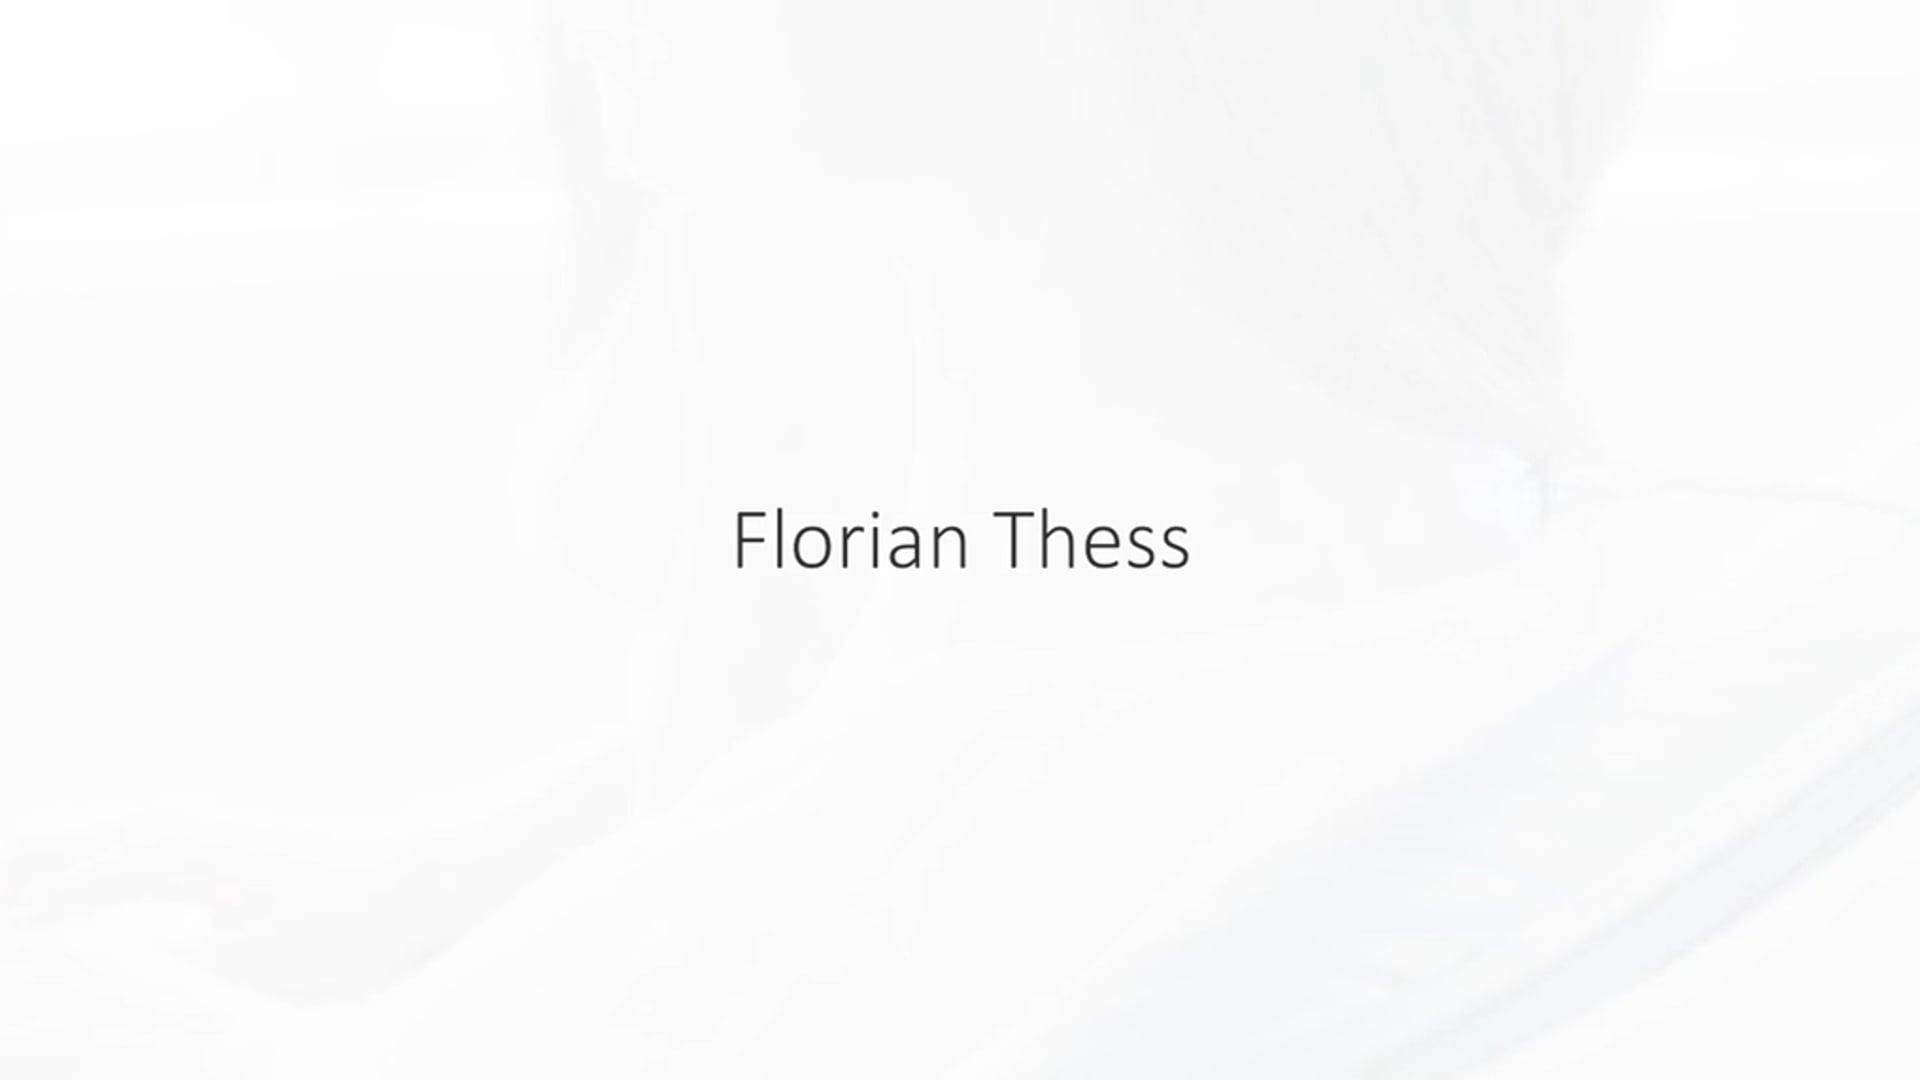 Florian Thess